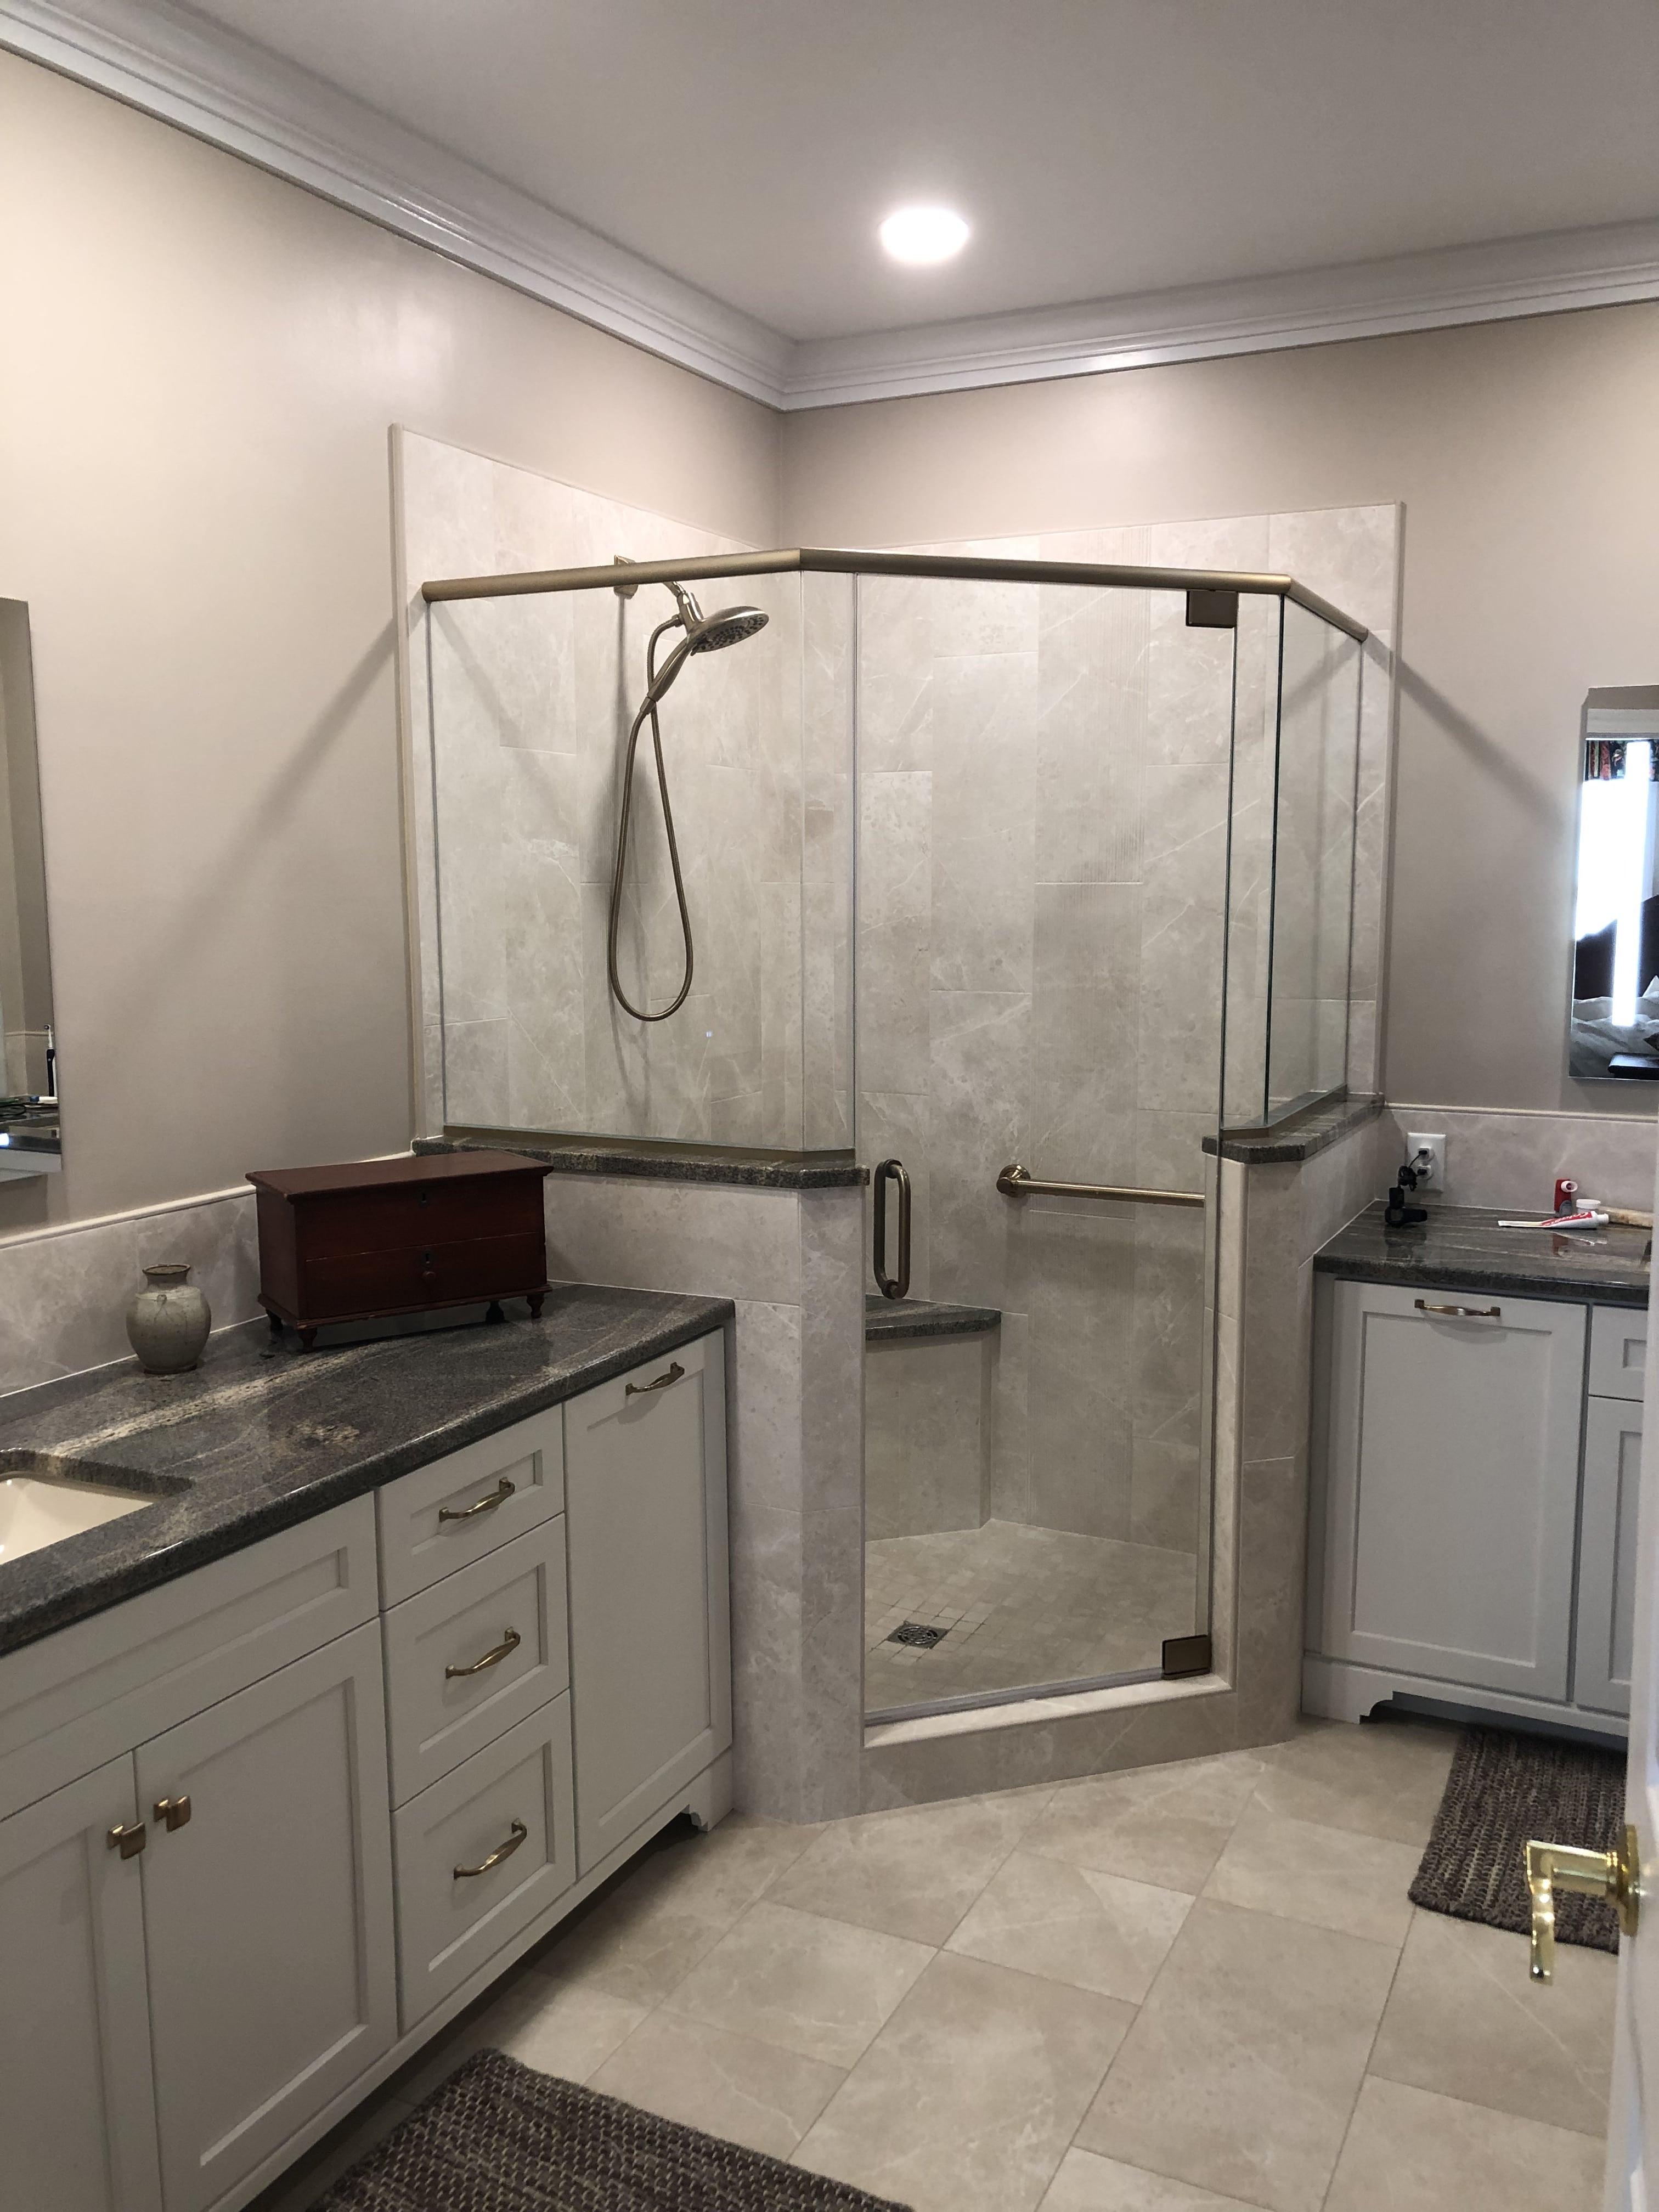 bathrooms builder, custom home designs, york, county, harrisburg, lancaster, pa